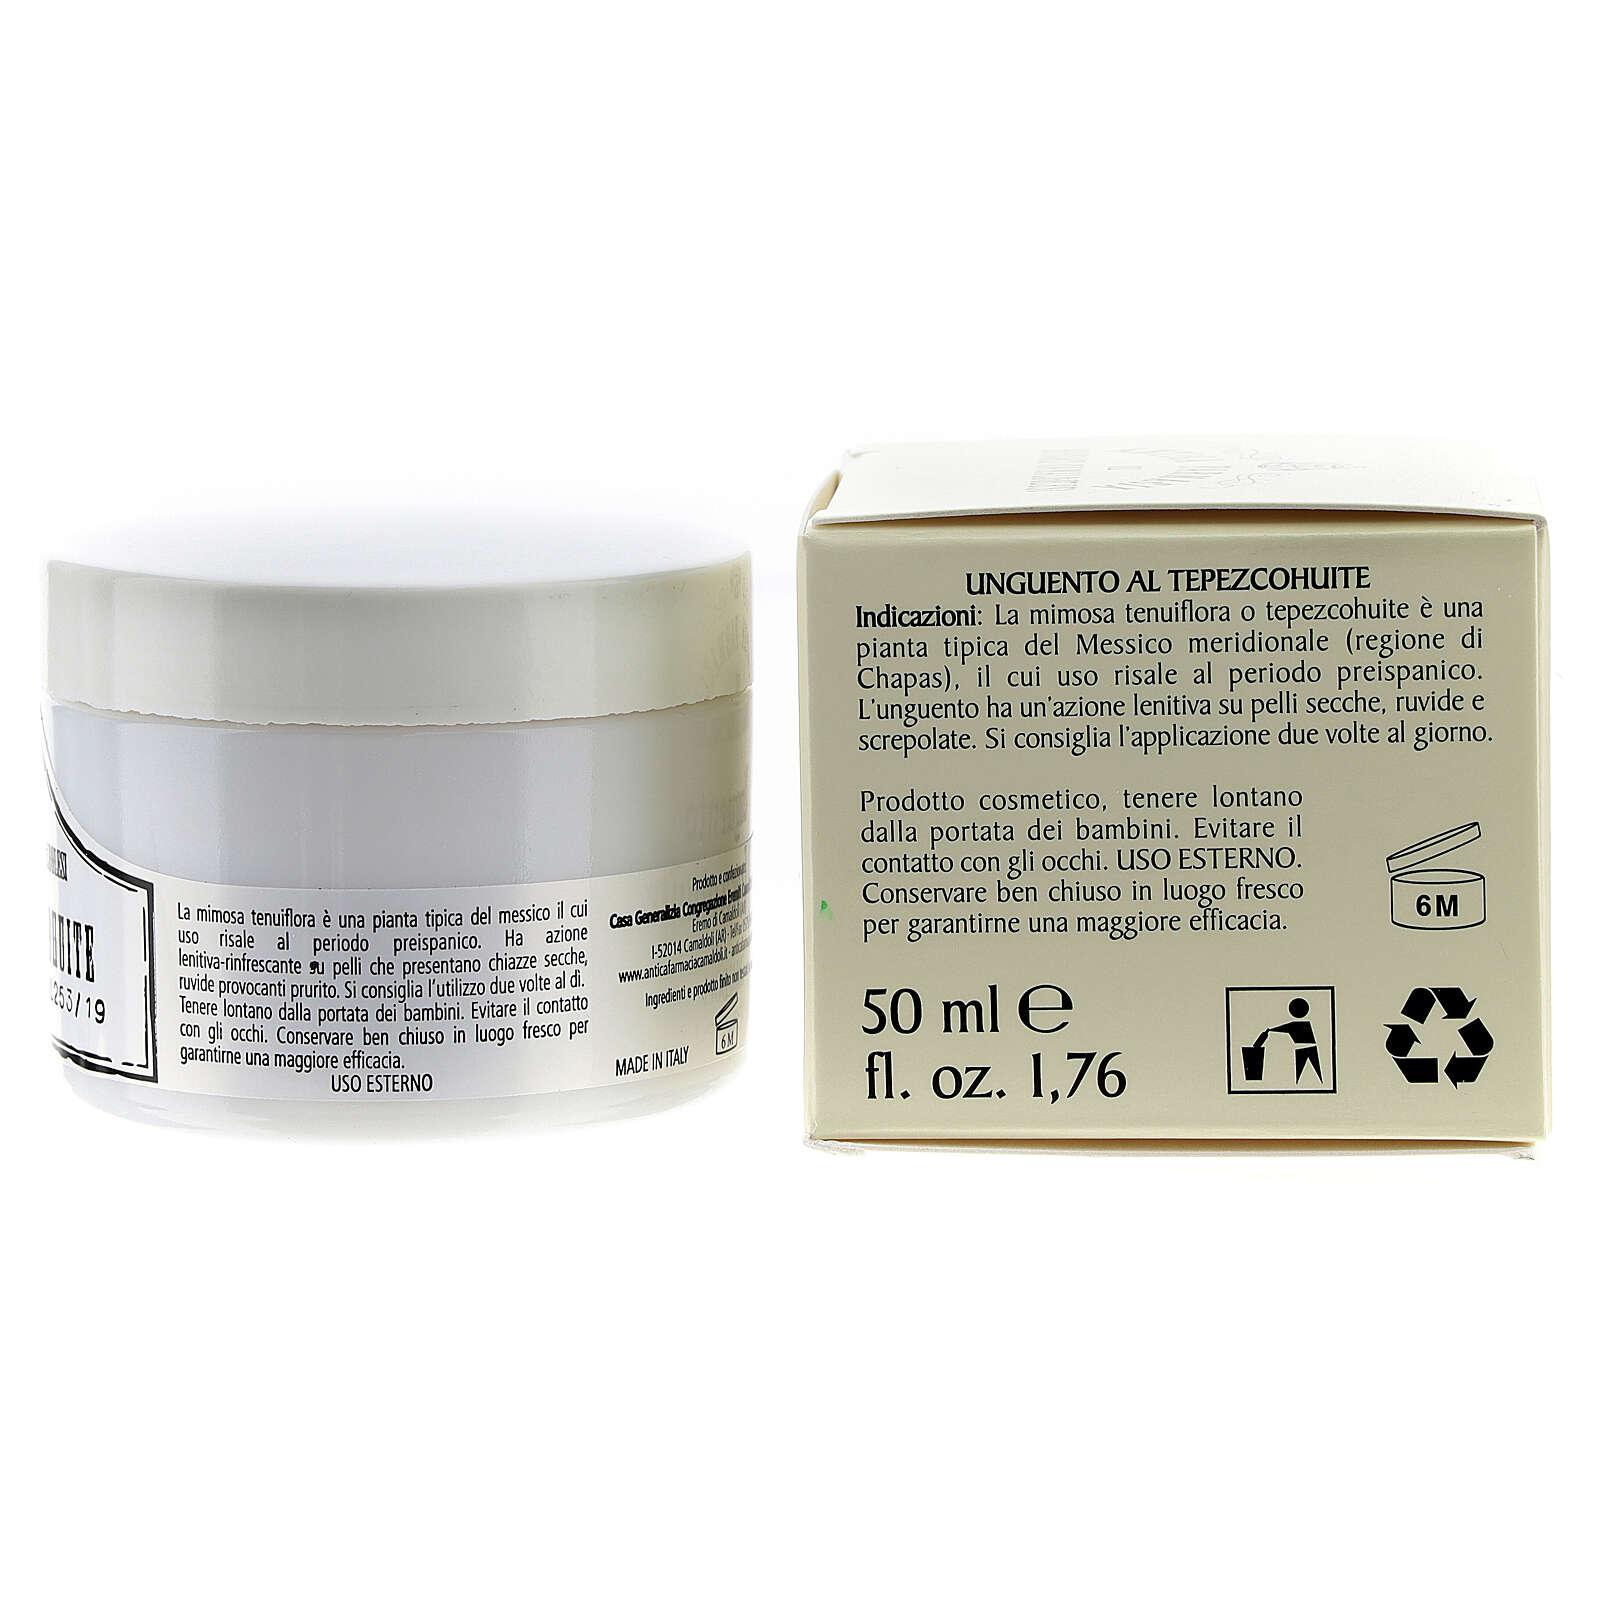 Pommade au Tepezcohuite (50 ml) 4